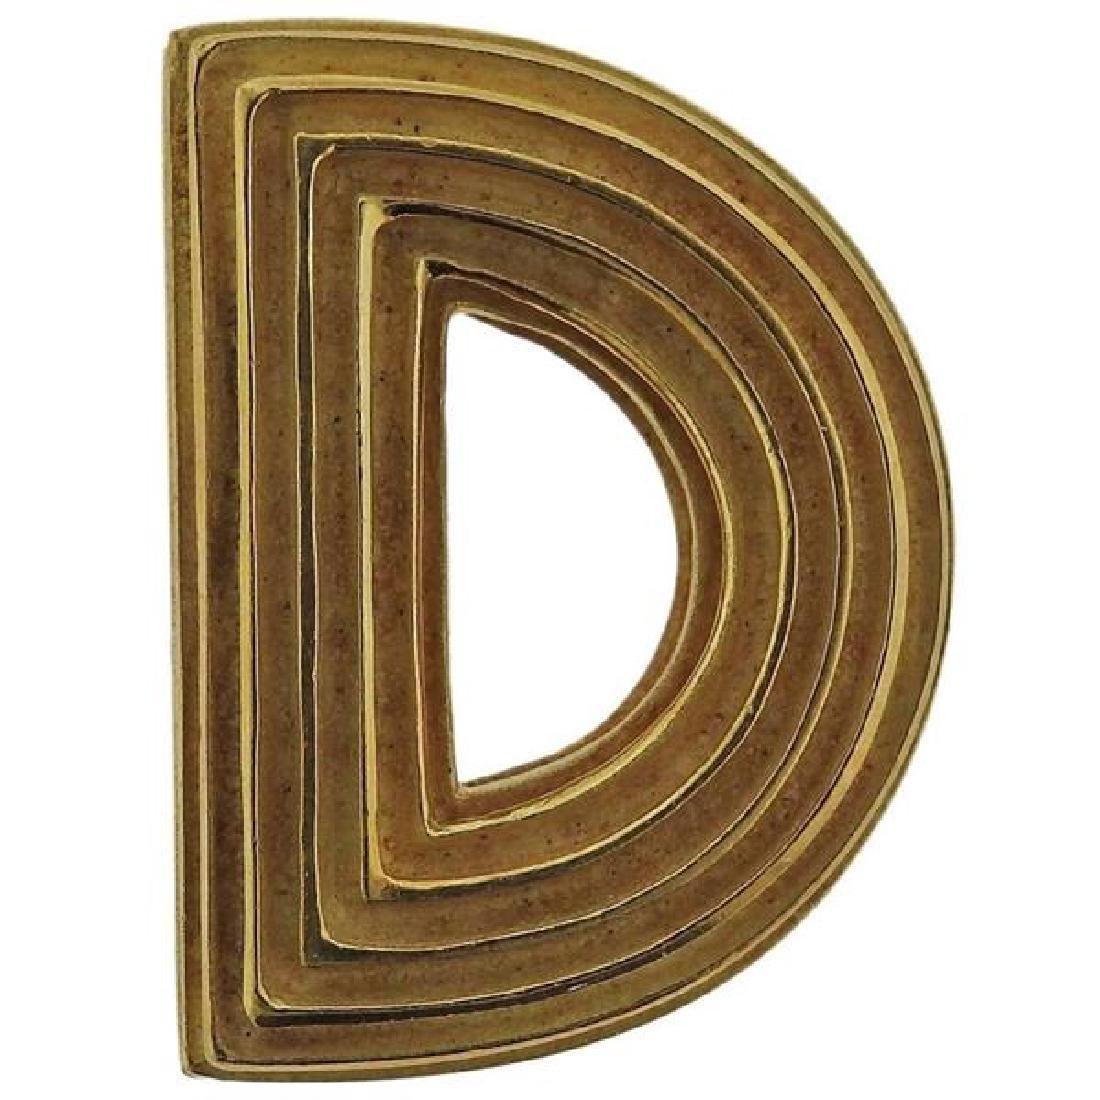 Christopher Walling Ridged Logic 18k Gold Brooch Pin